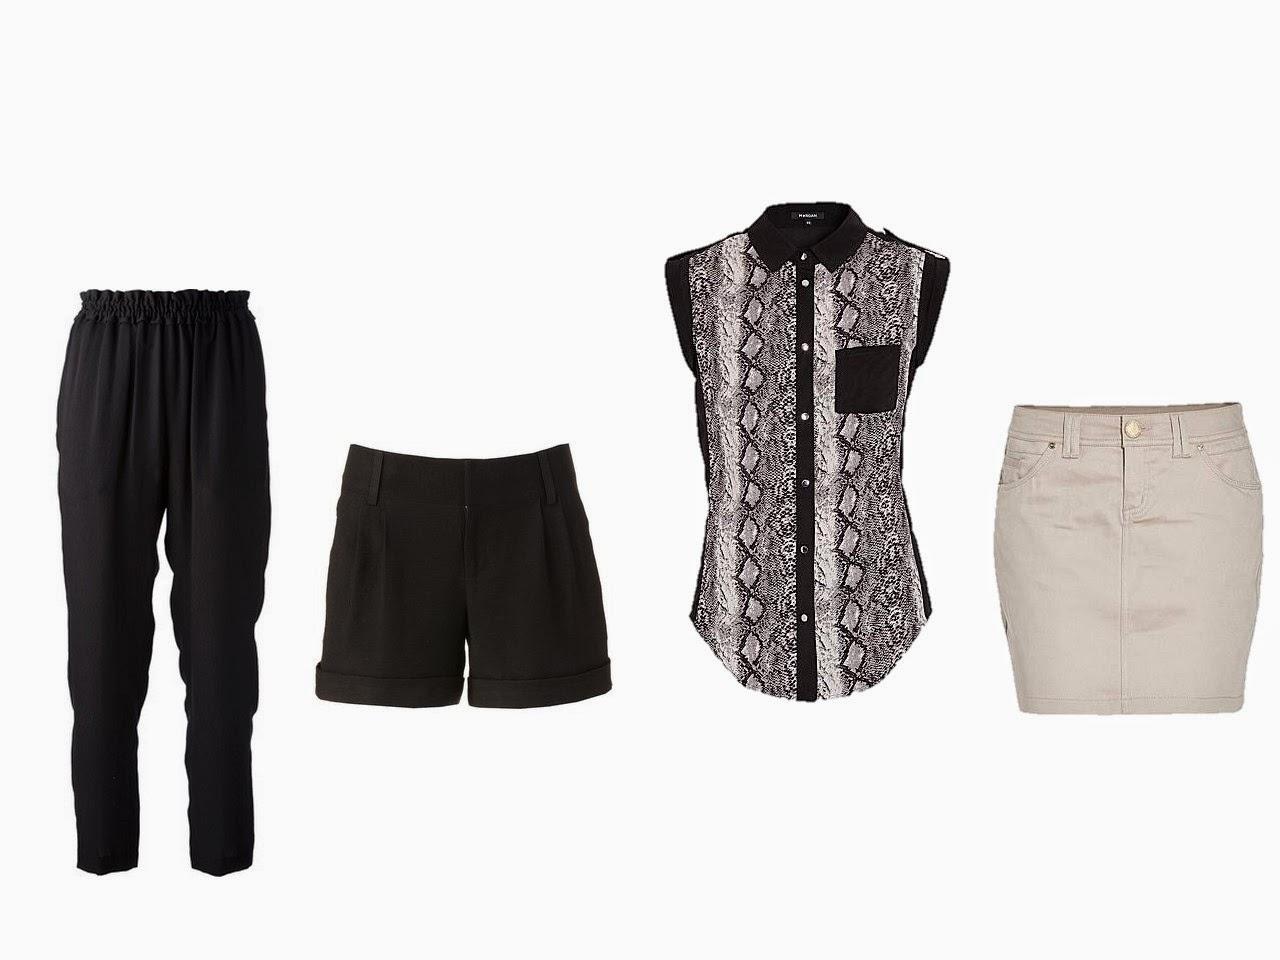 four fundamental garments: black pants, black shorts, black and beige top, beige skirt